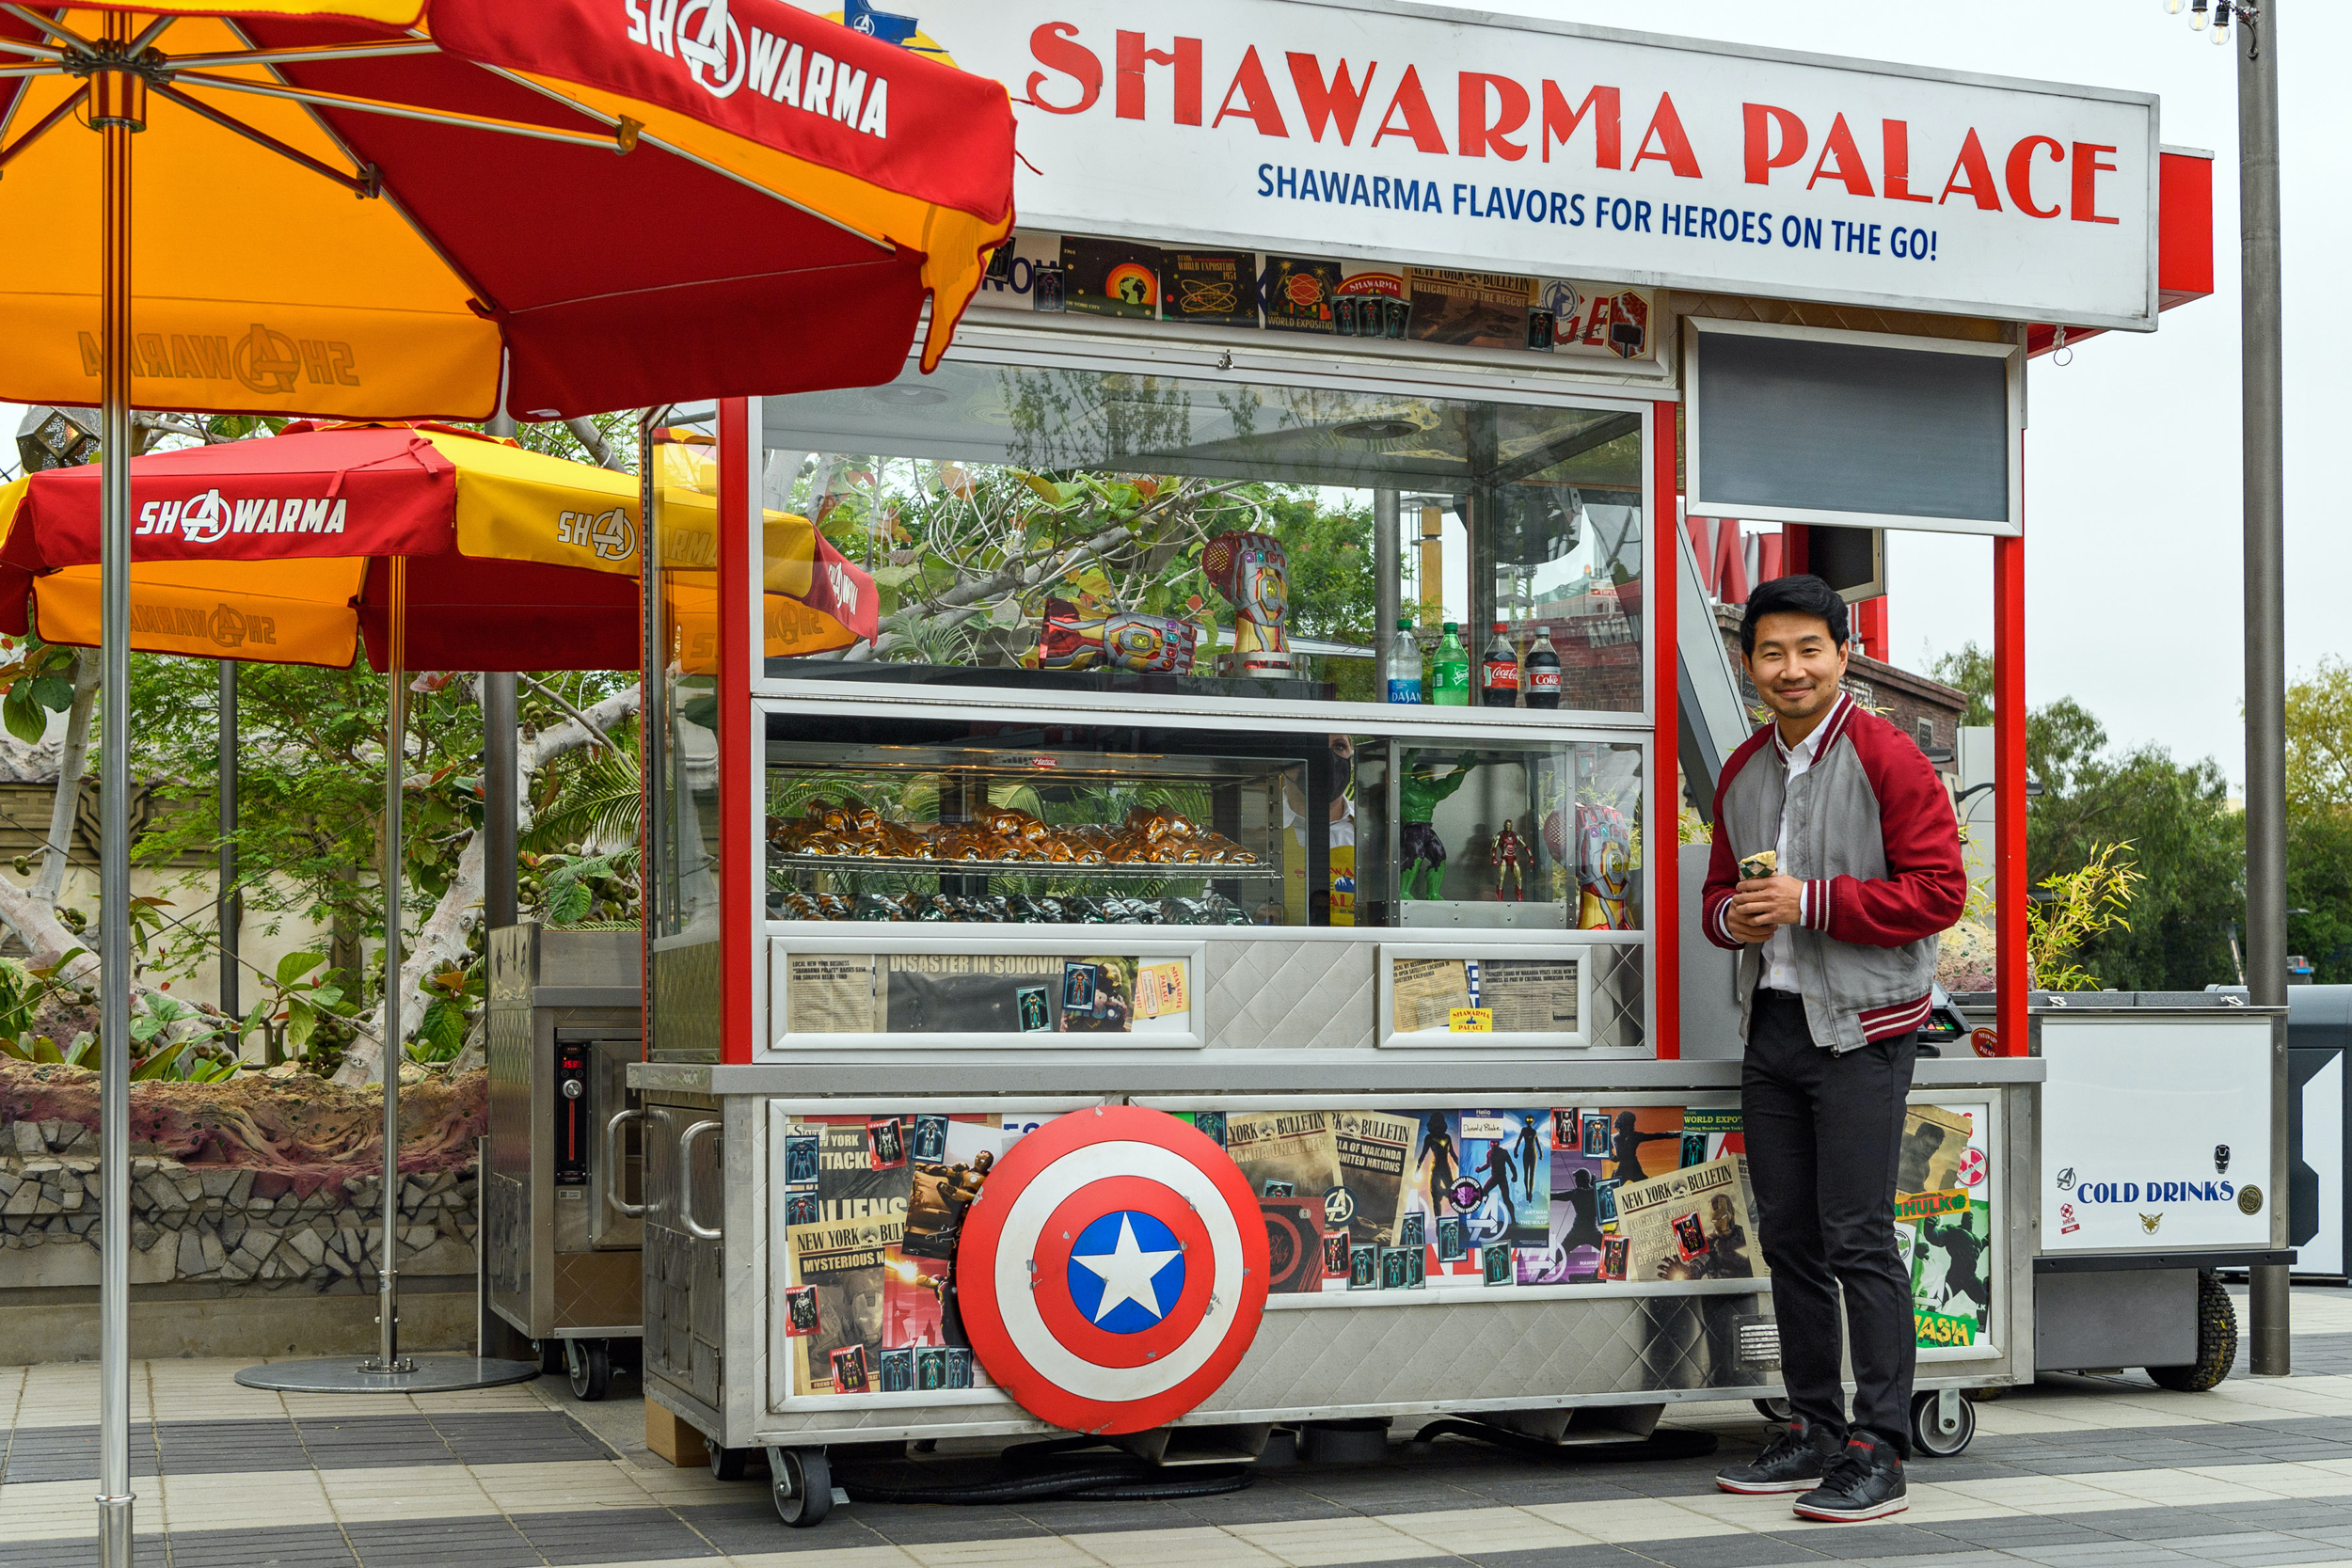 Liu visits Shawarma Palace in Avengers Campus at the Disneyland Resort (Richard Harbaugh/Disneyland Resort/Getty Images)